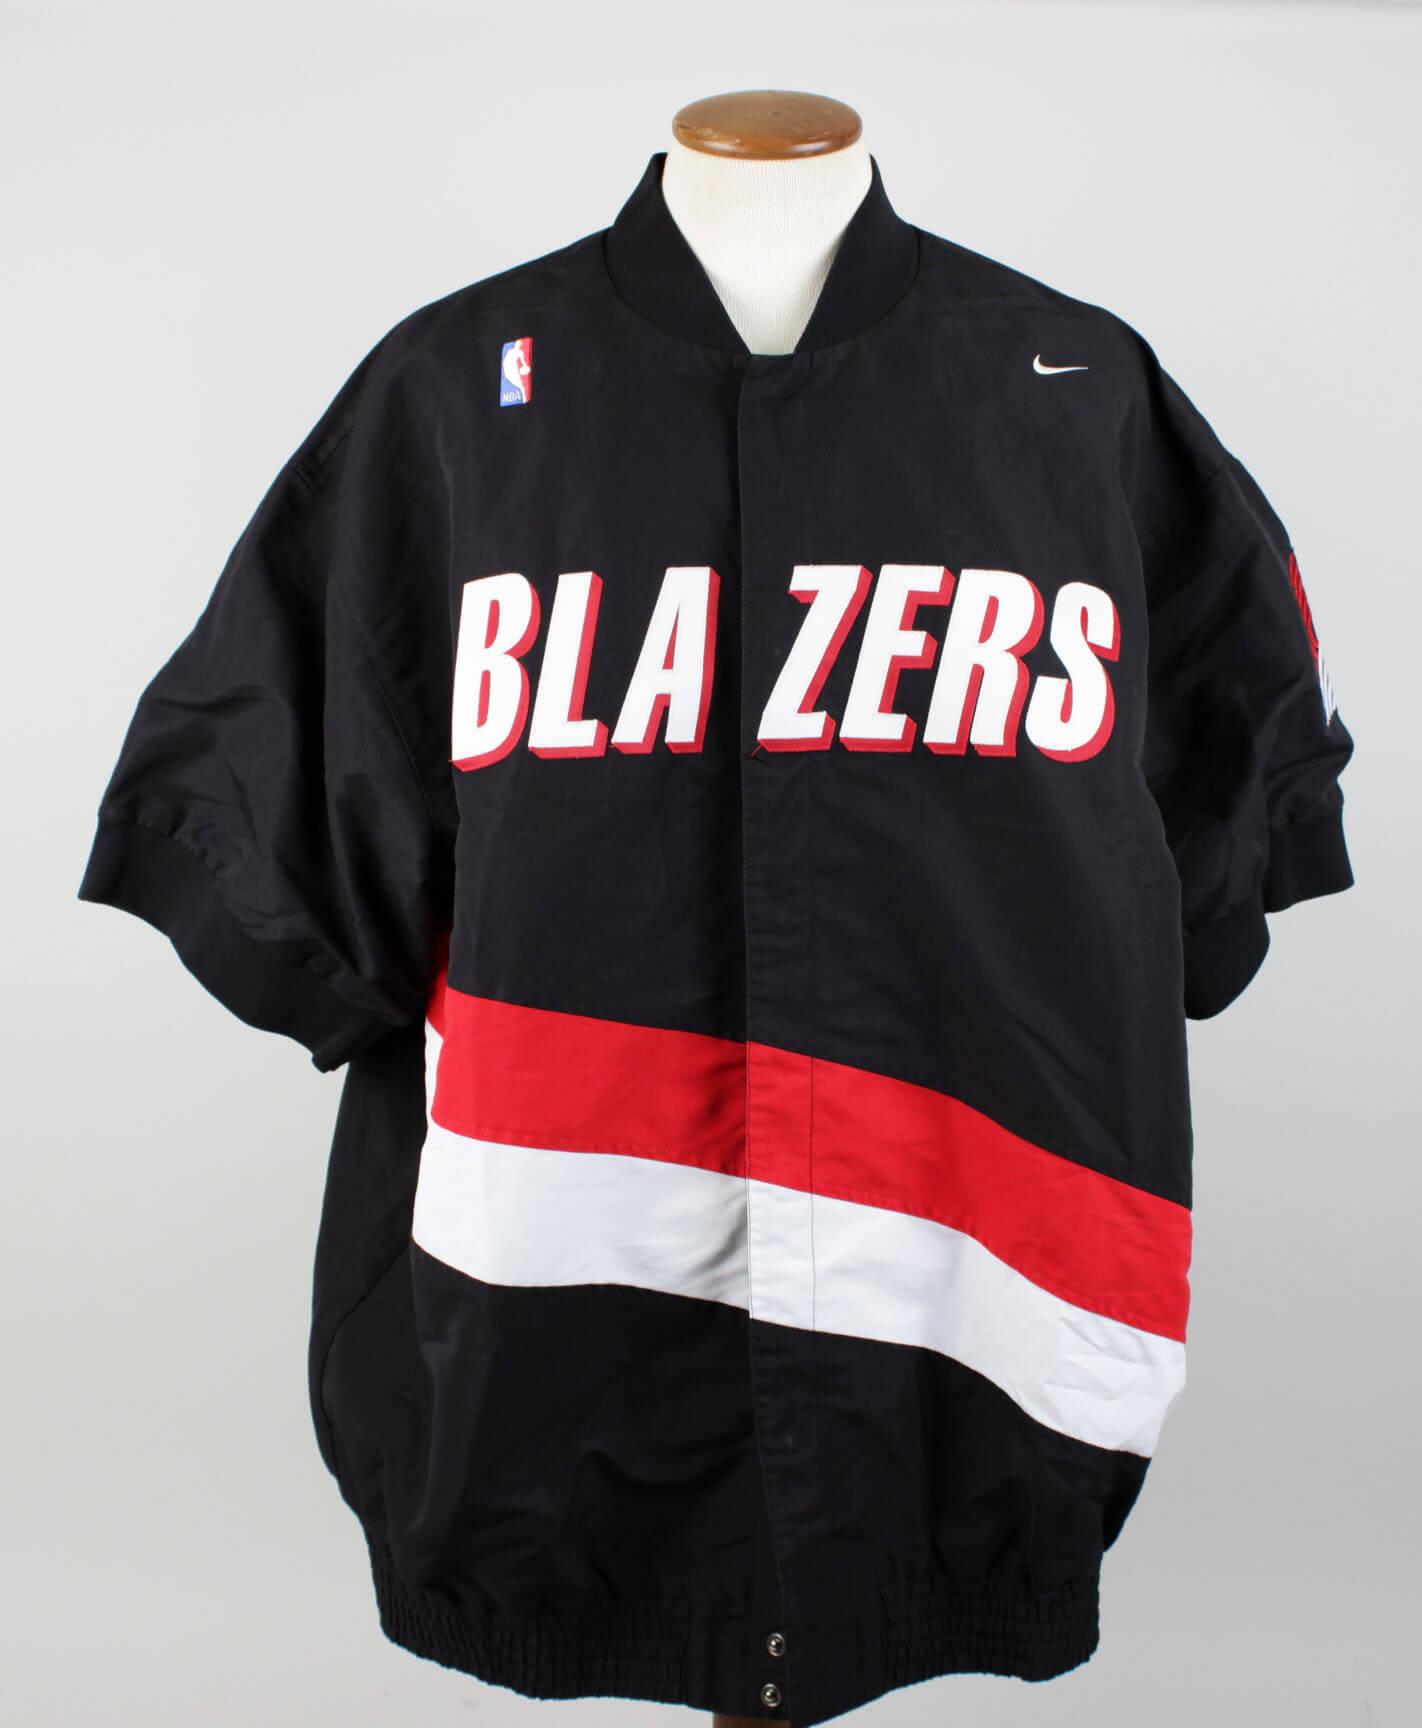 97-98 Portland Trail Blazers Kelvin Cato Game-Worn Warm-Up